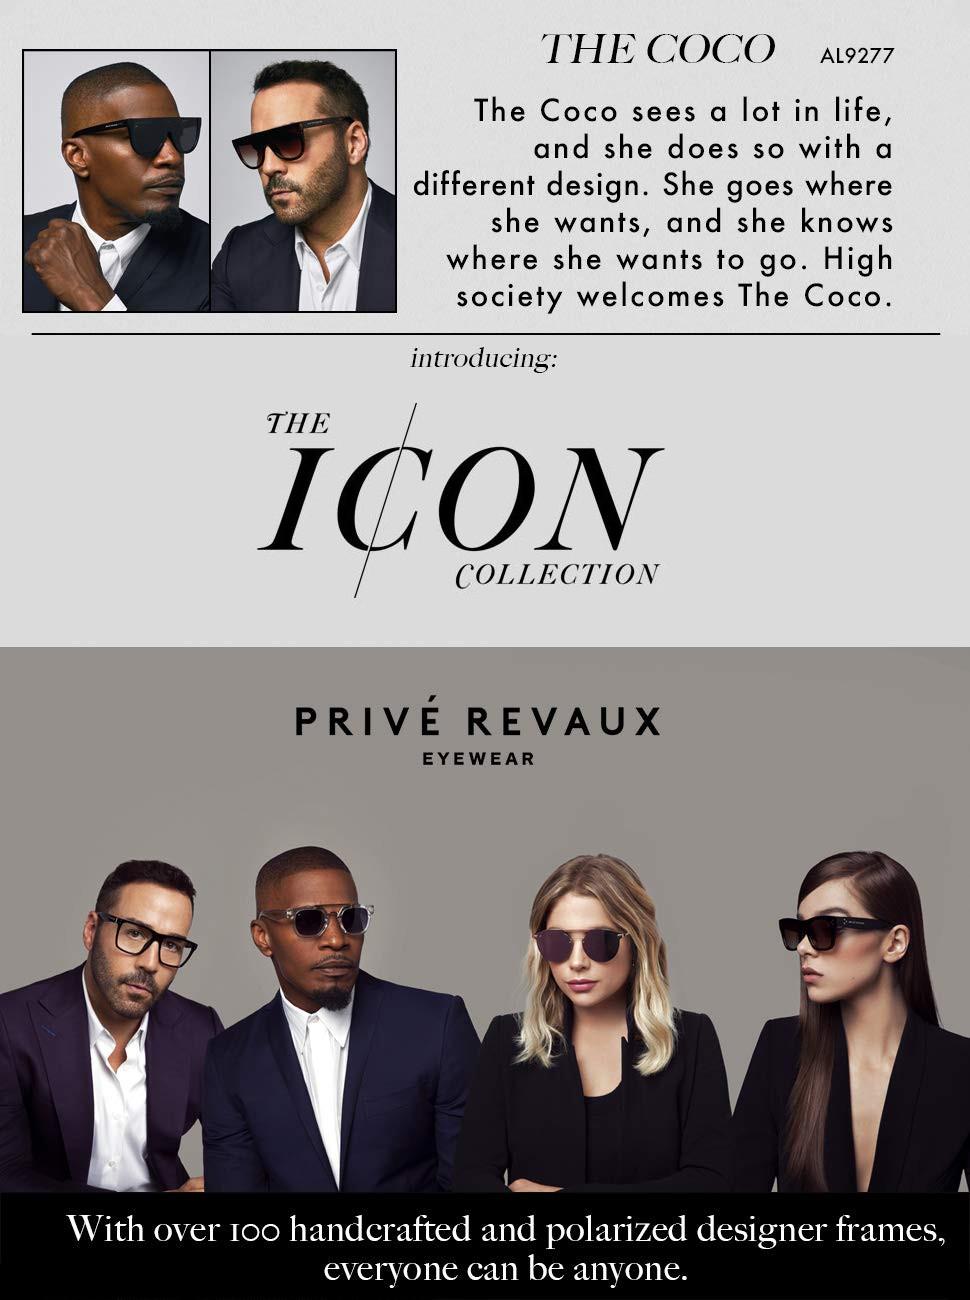 f5e01cd8a8 prive revaux,quality,designer,sunglasses,glasses,eyewear,lenses,polarized